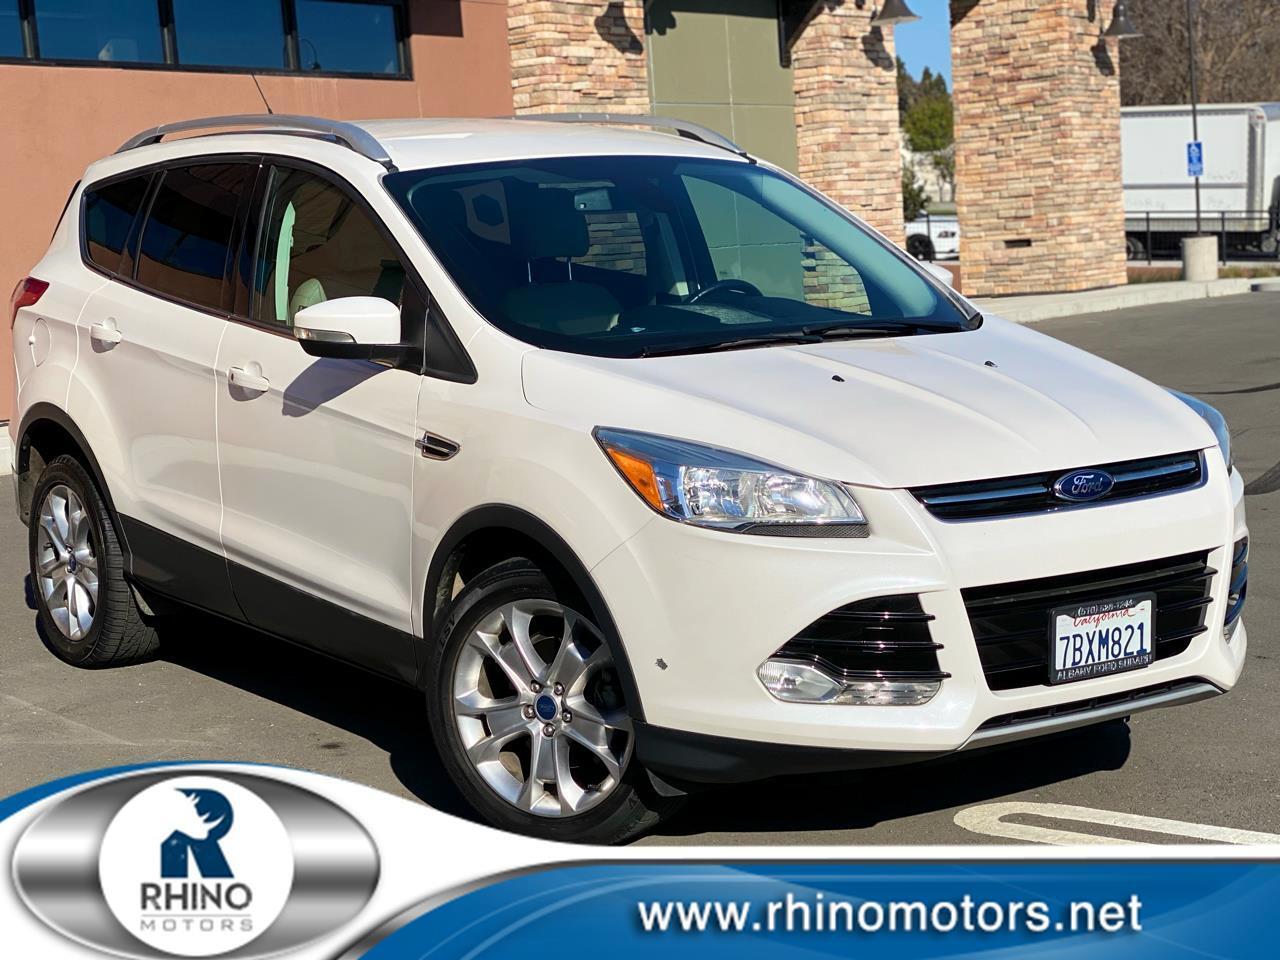 Ford Escape FWD 4dr Titanium 2014